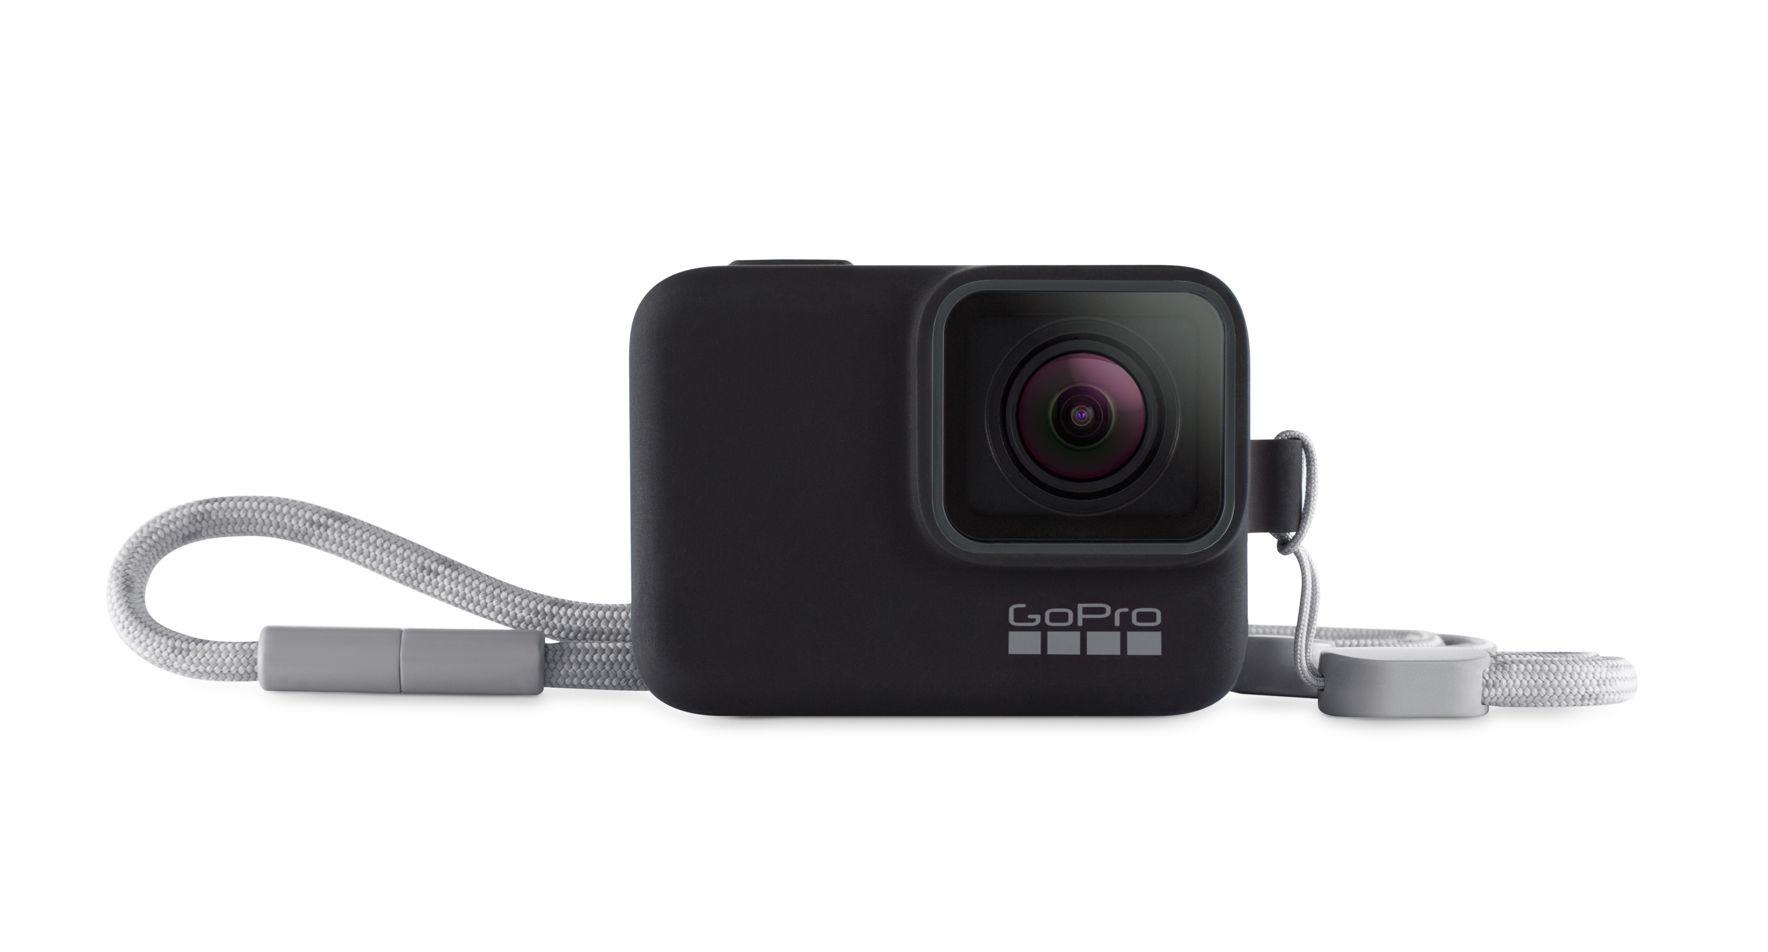 GoPro GoPro Travel Kit